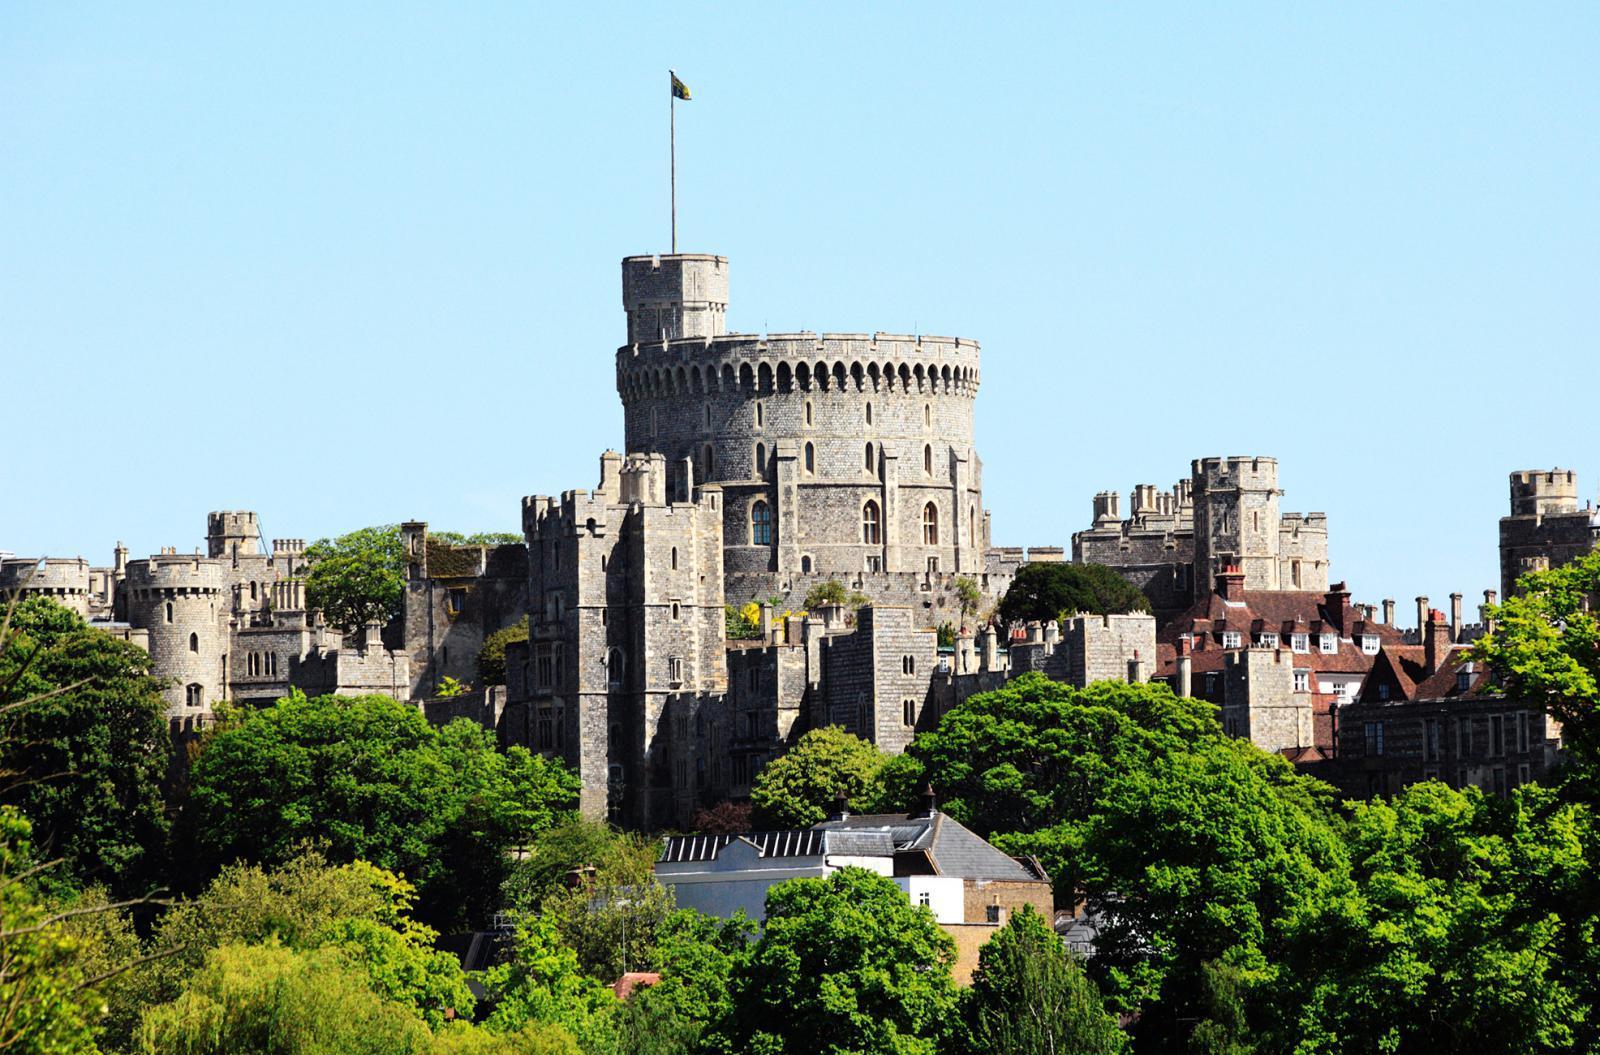 Windsor Castle aus der Vogelperspektive